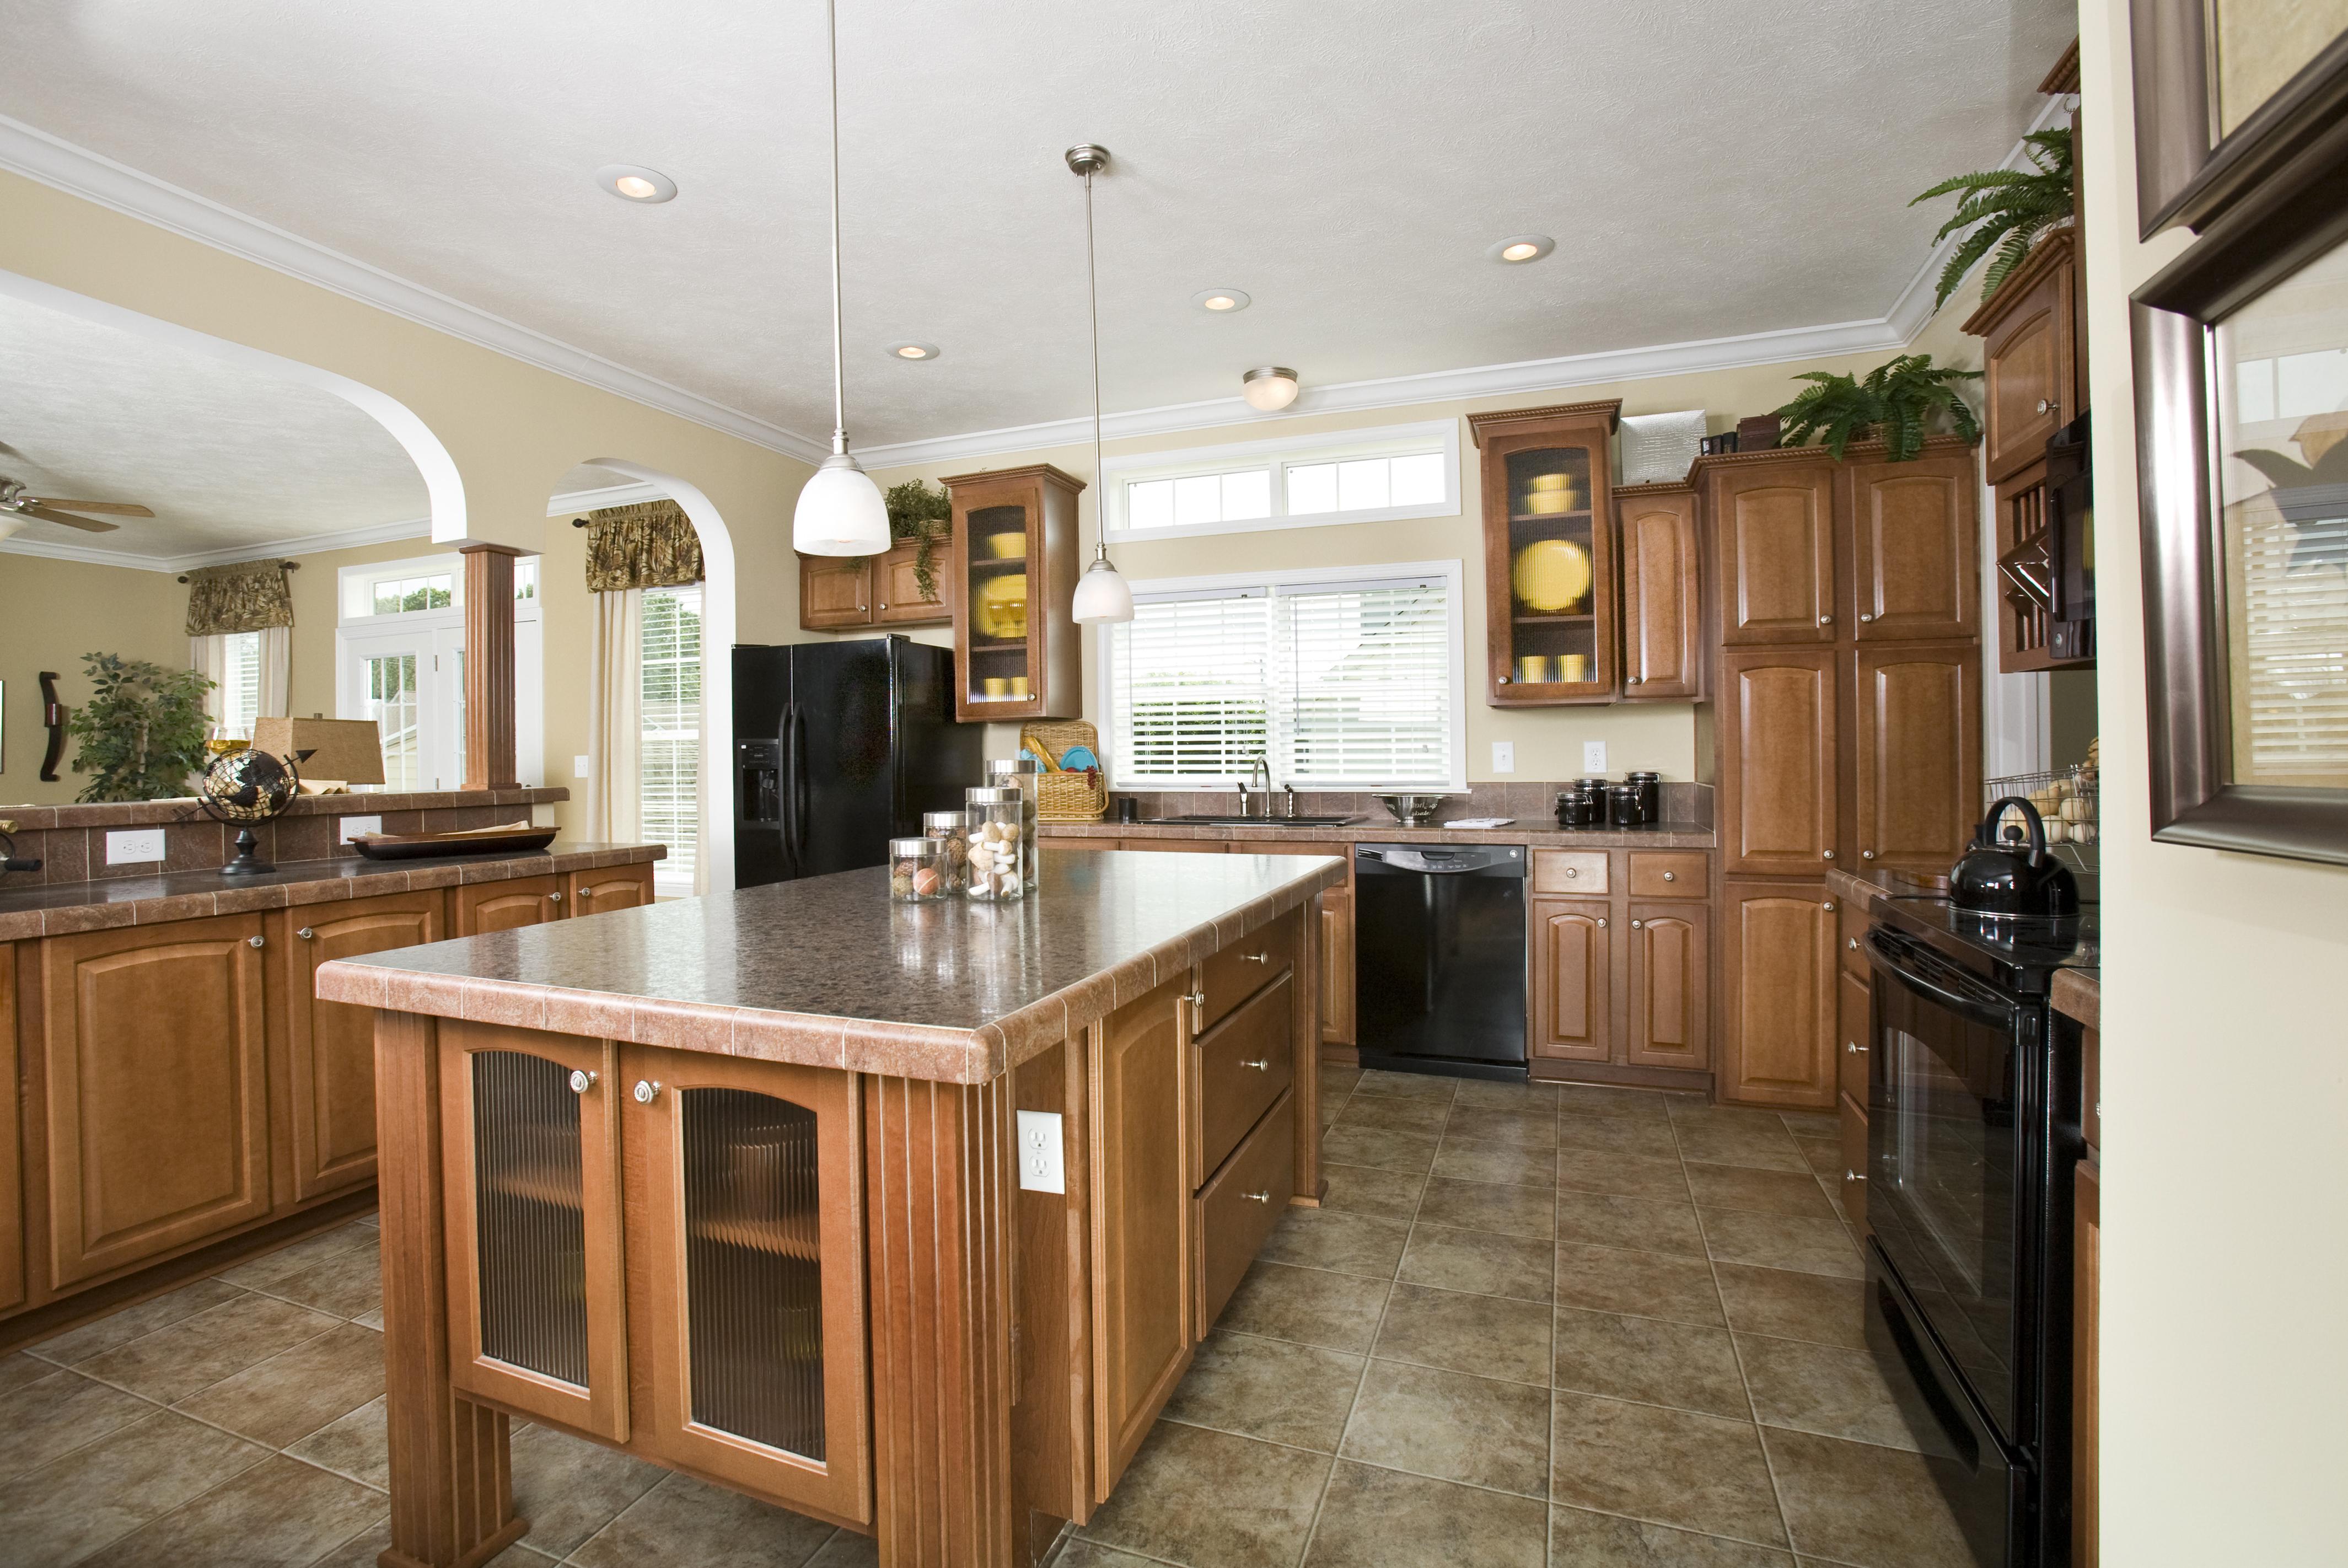 Rockbridge Modular Homes Burlington Rj518a Find A Home R